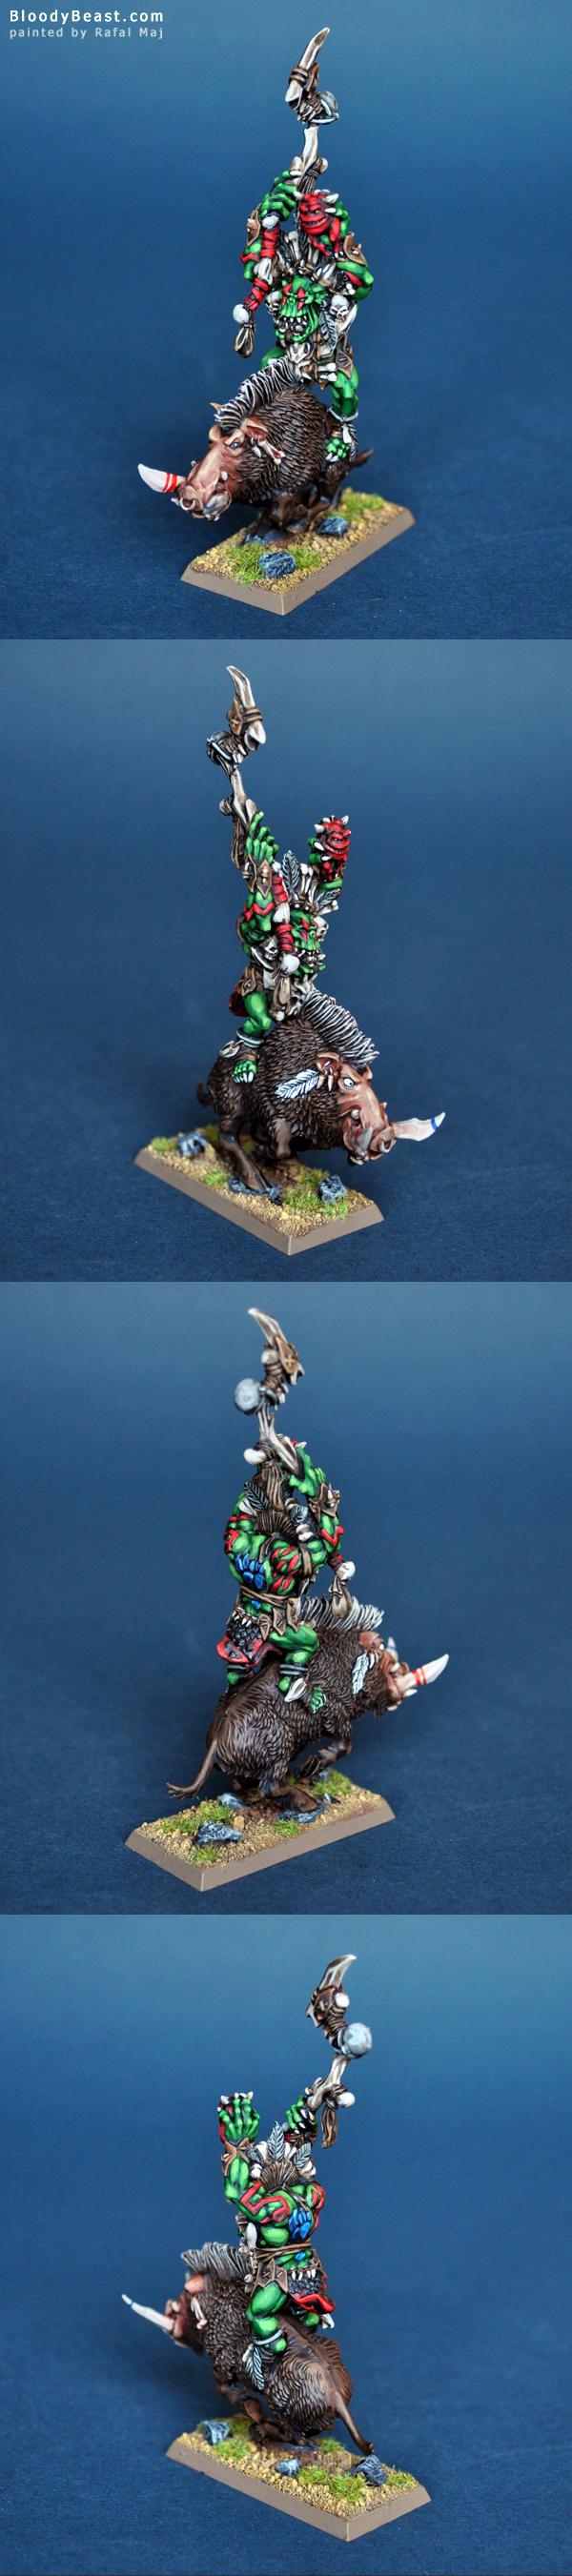 Savage Orc Great Shaman on Boar painted by Rafal Maj (BloodyBeast.com)